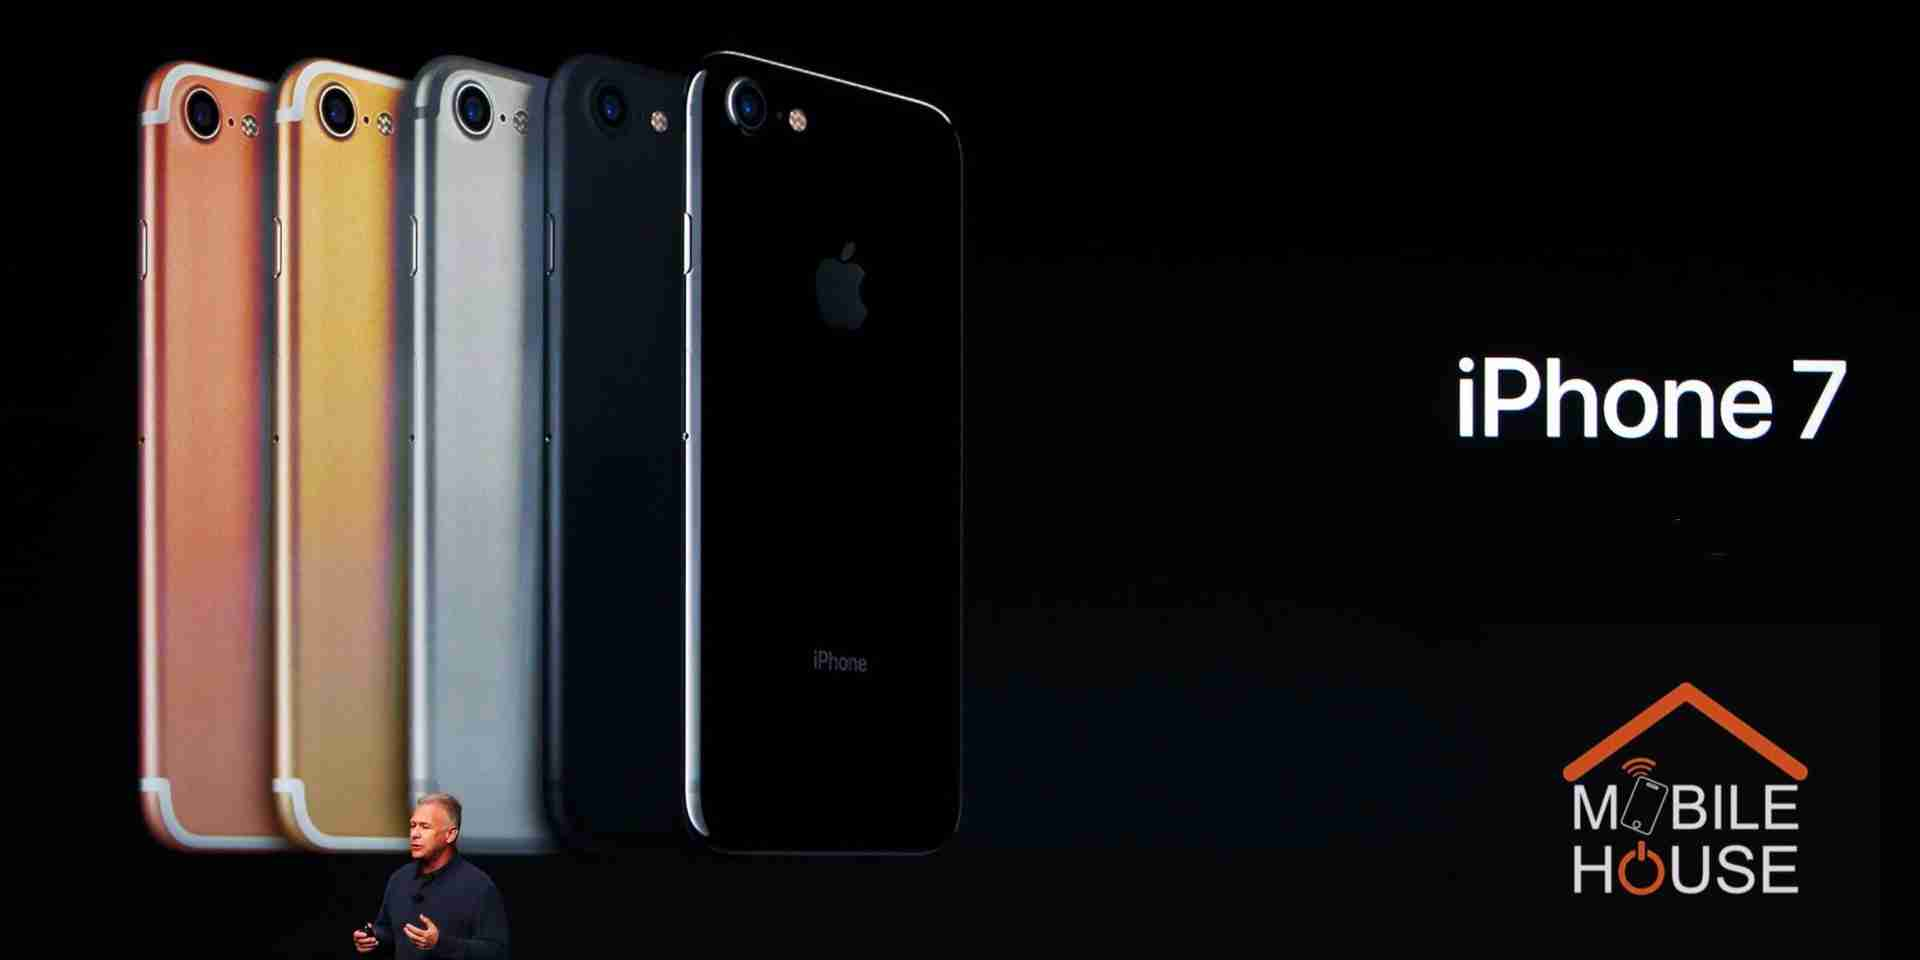 Apple iPhone 7 Plus 128GB( Free iWatch ) Free Shipping Delivery - Dhl , Fedex $350New OriginalApple iPhone 7+ Plus 128GB GSM Unlocked,Sim-Free warranty - Apple -  ايفون 7 جديد مسكر كفالة...